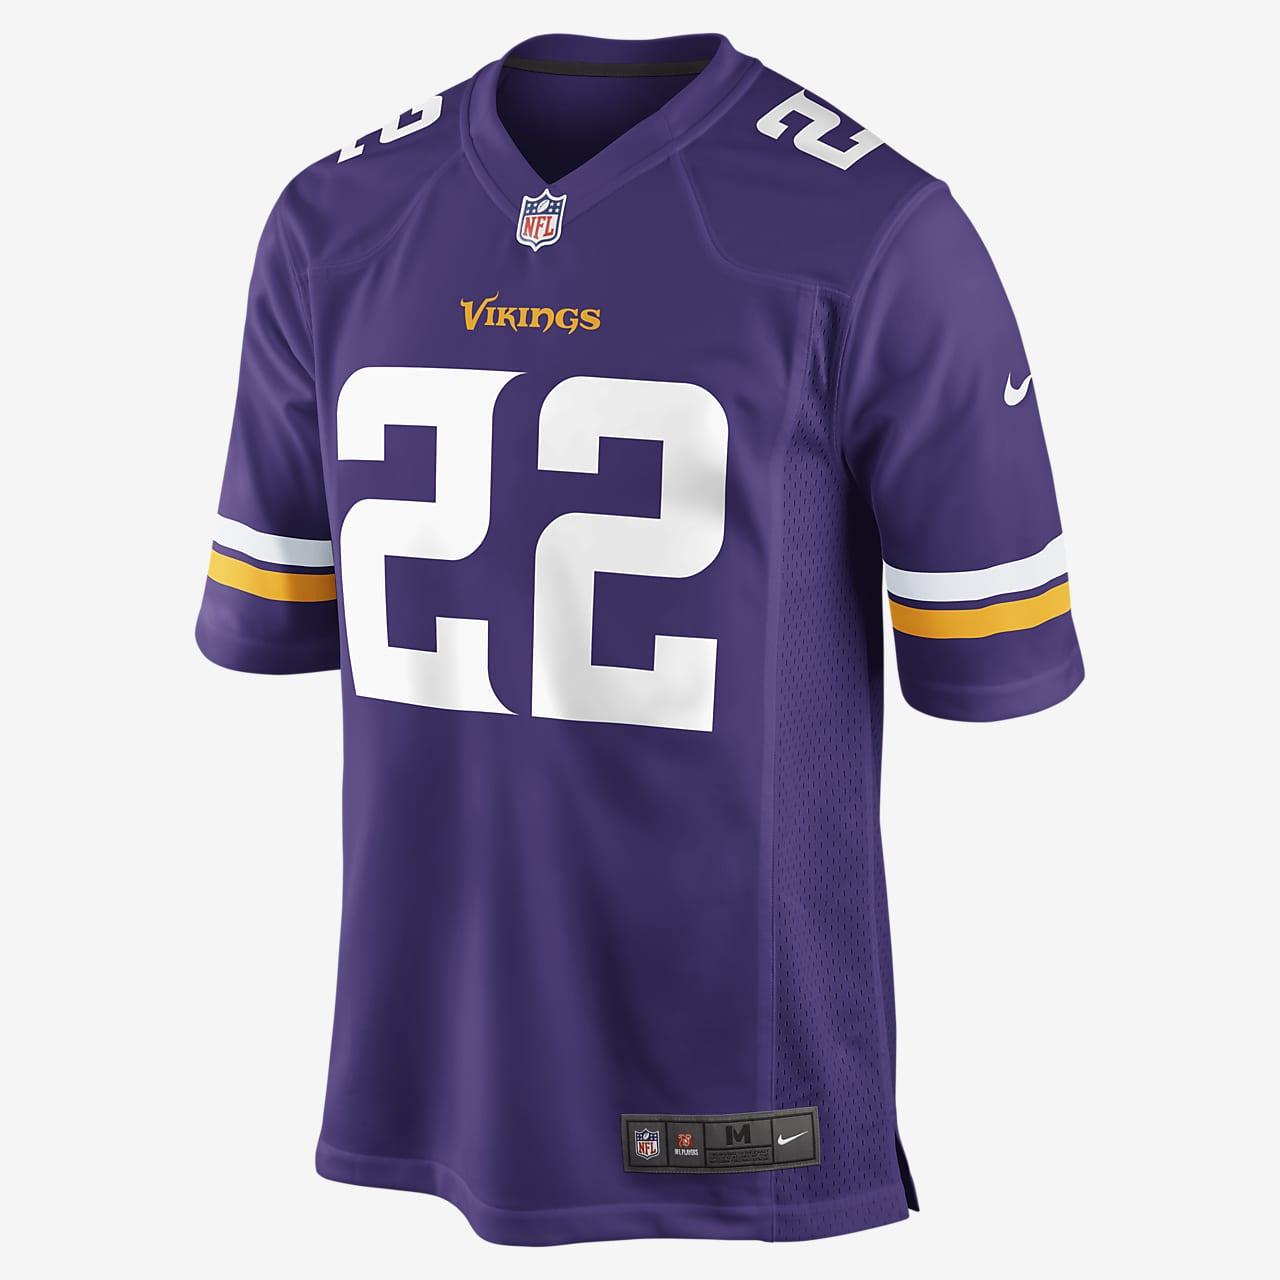 NFL Minnesota Vikings (Harrison Smith) Men's Game Football Jersey